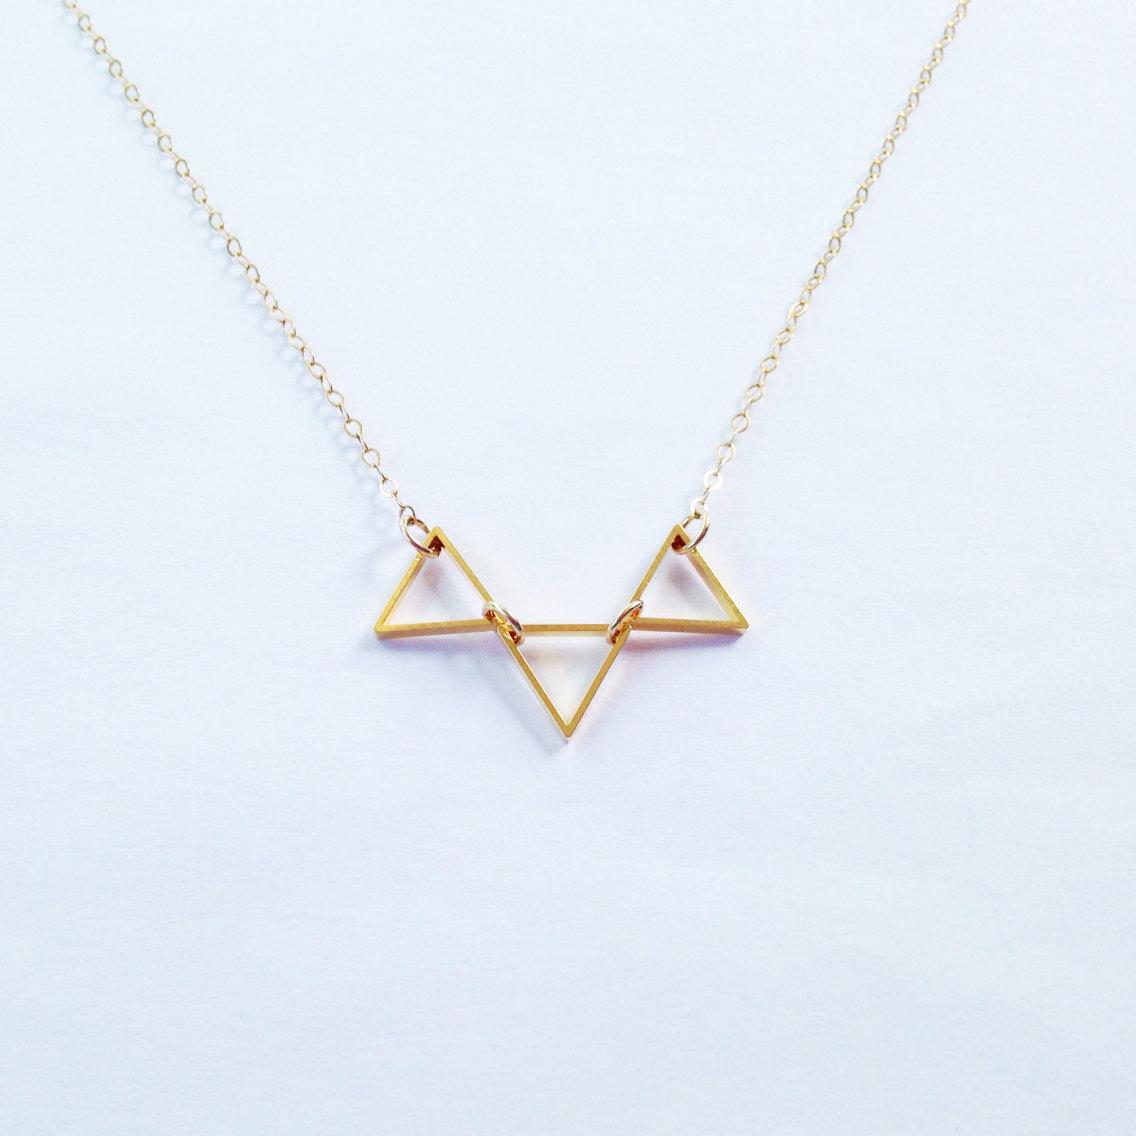 Trinity - Minimalist Trio Necklace, Minimalist Necklace, Gold Triangle, Simple Necklace